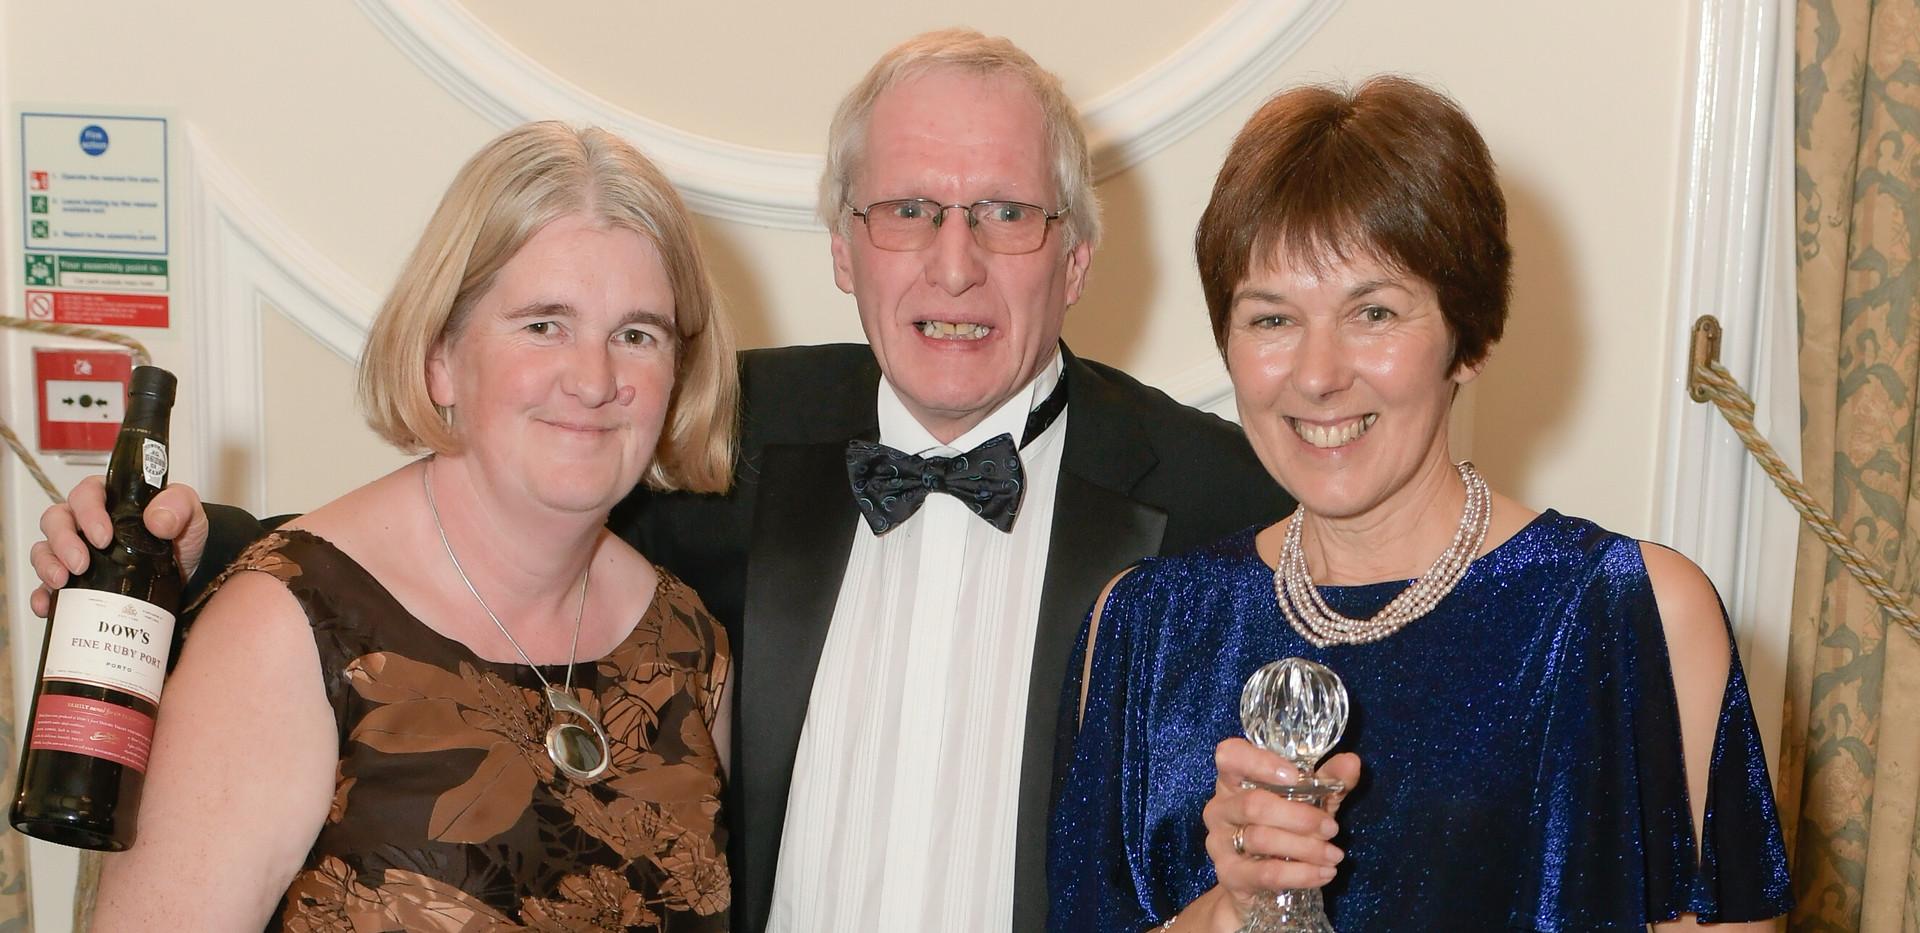 Terry and Tricia Davis receiving the Pilbeam Mick Howlett Award from Sue Fletcher